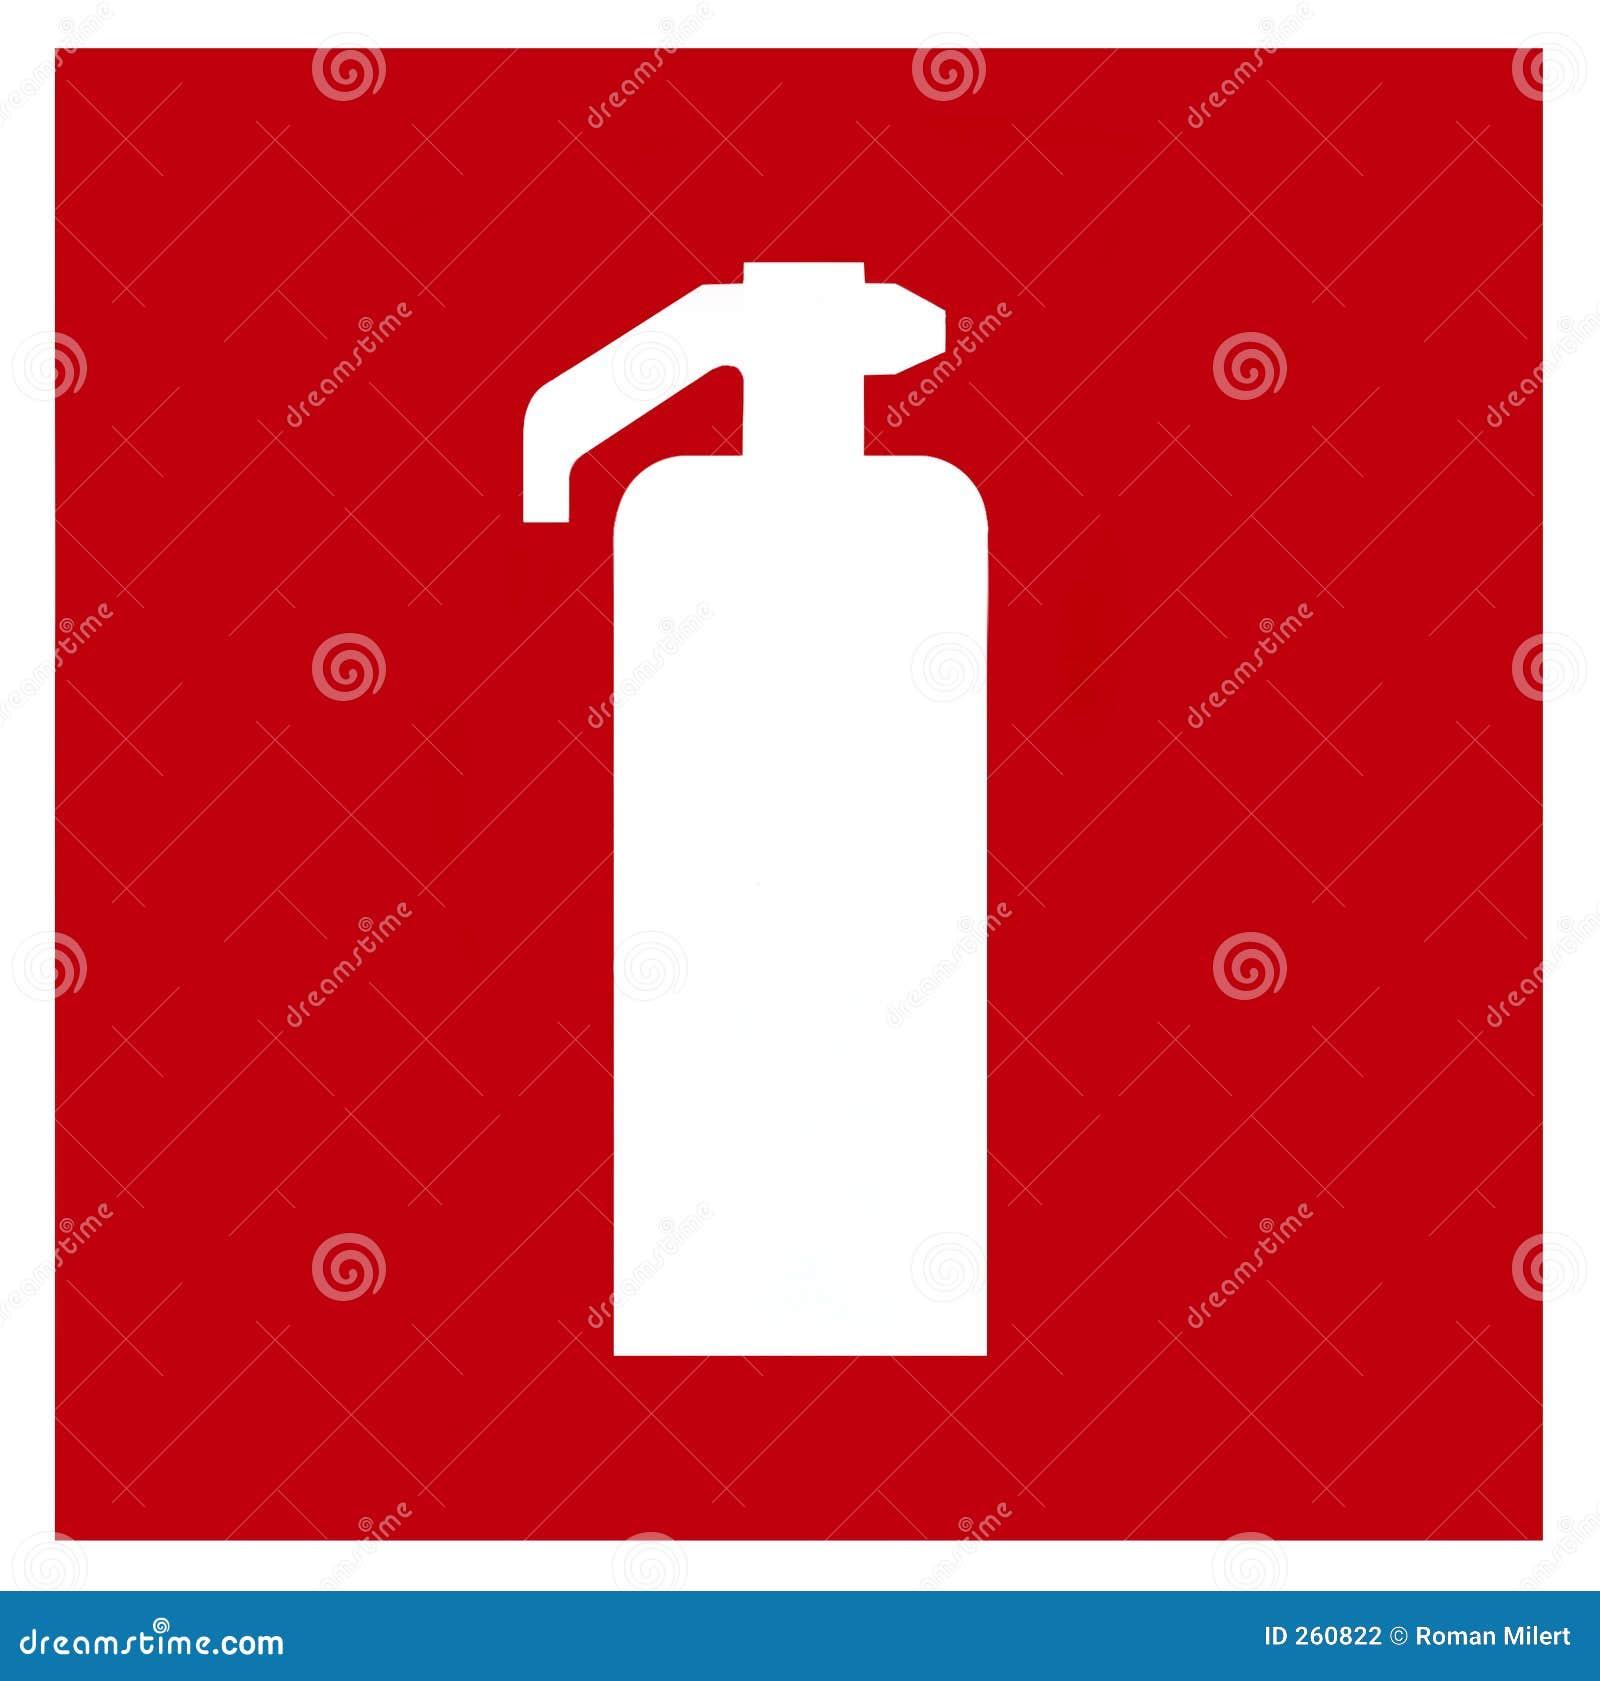 Fire Extinguisher Symbol Stock Photography - Image: 260822